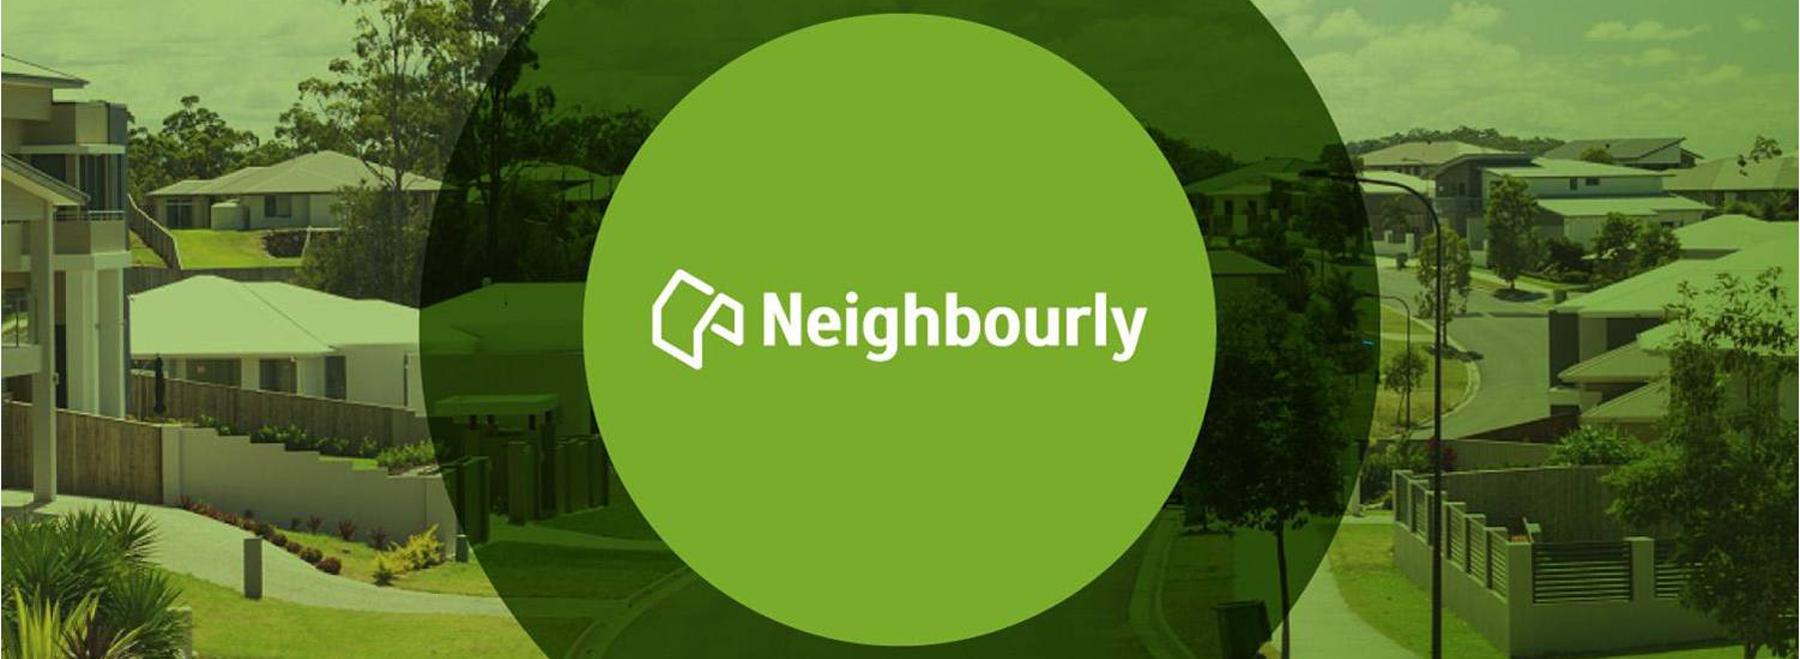 Fairfax Media & Neighbourly: growing engagement